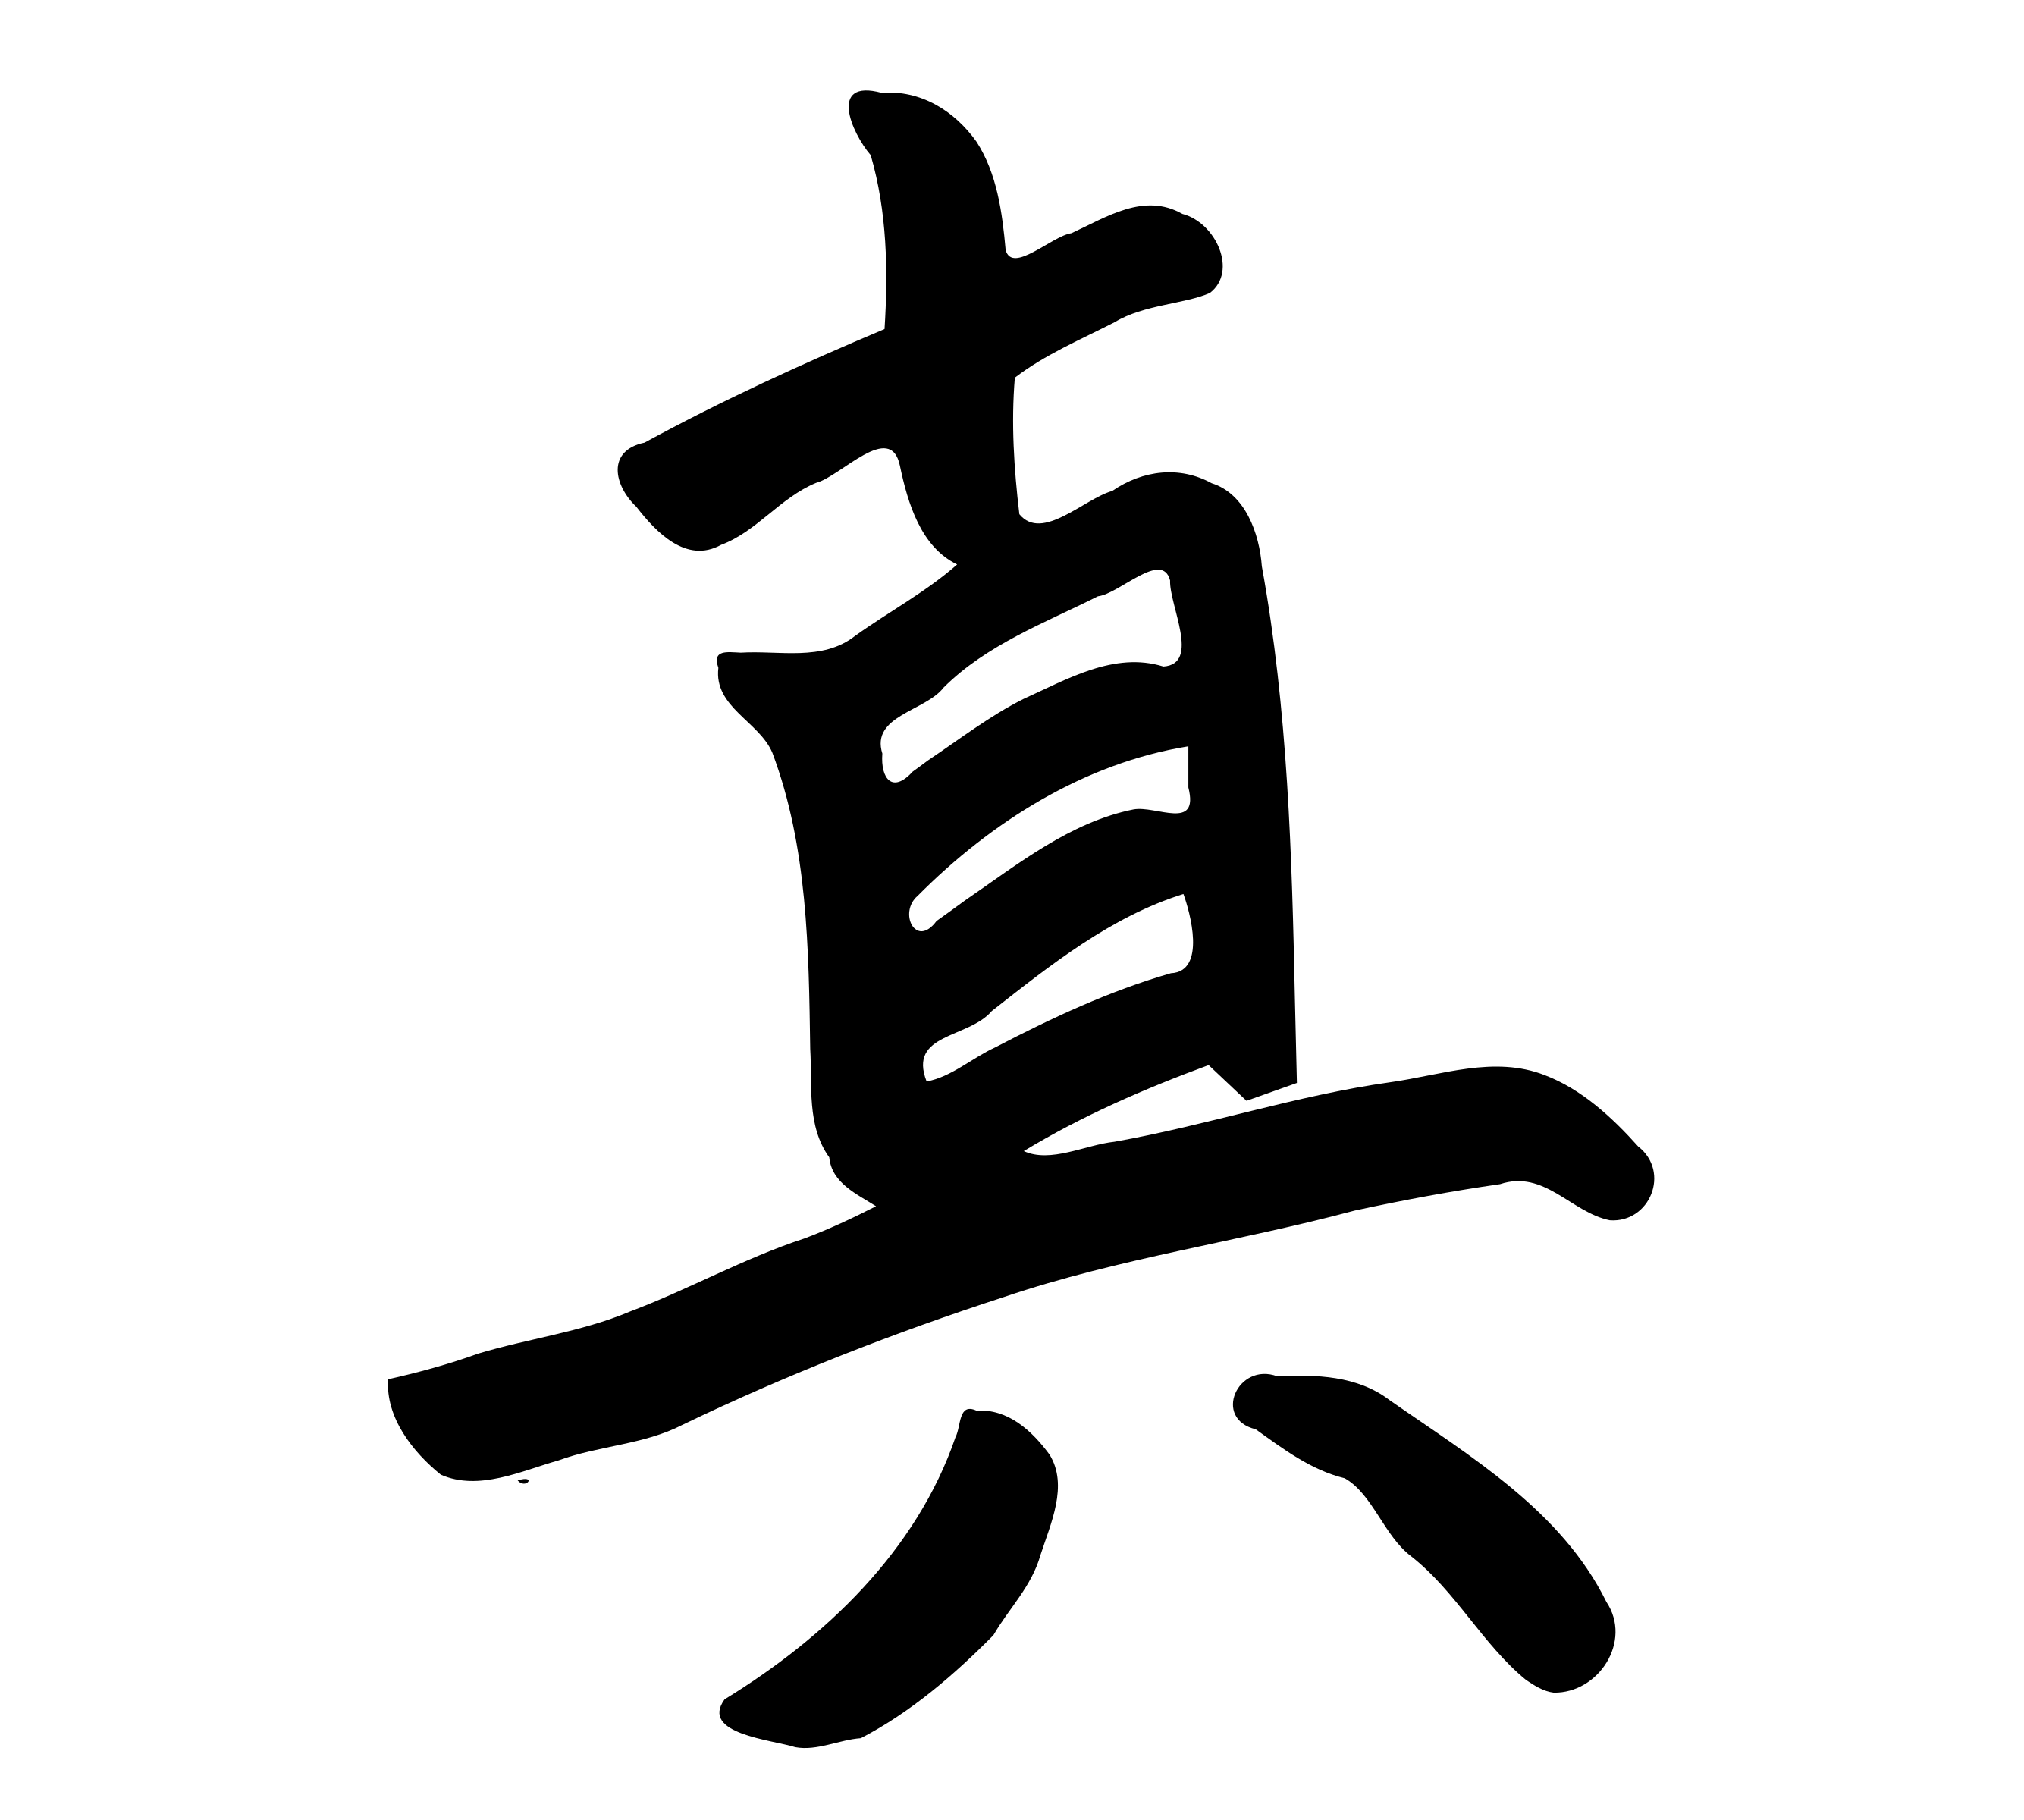 Japanese kanji transparent clipart - ClipartFest clipart black and white